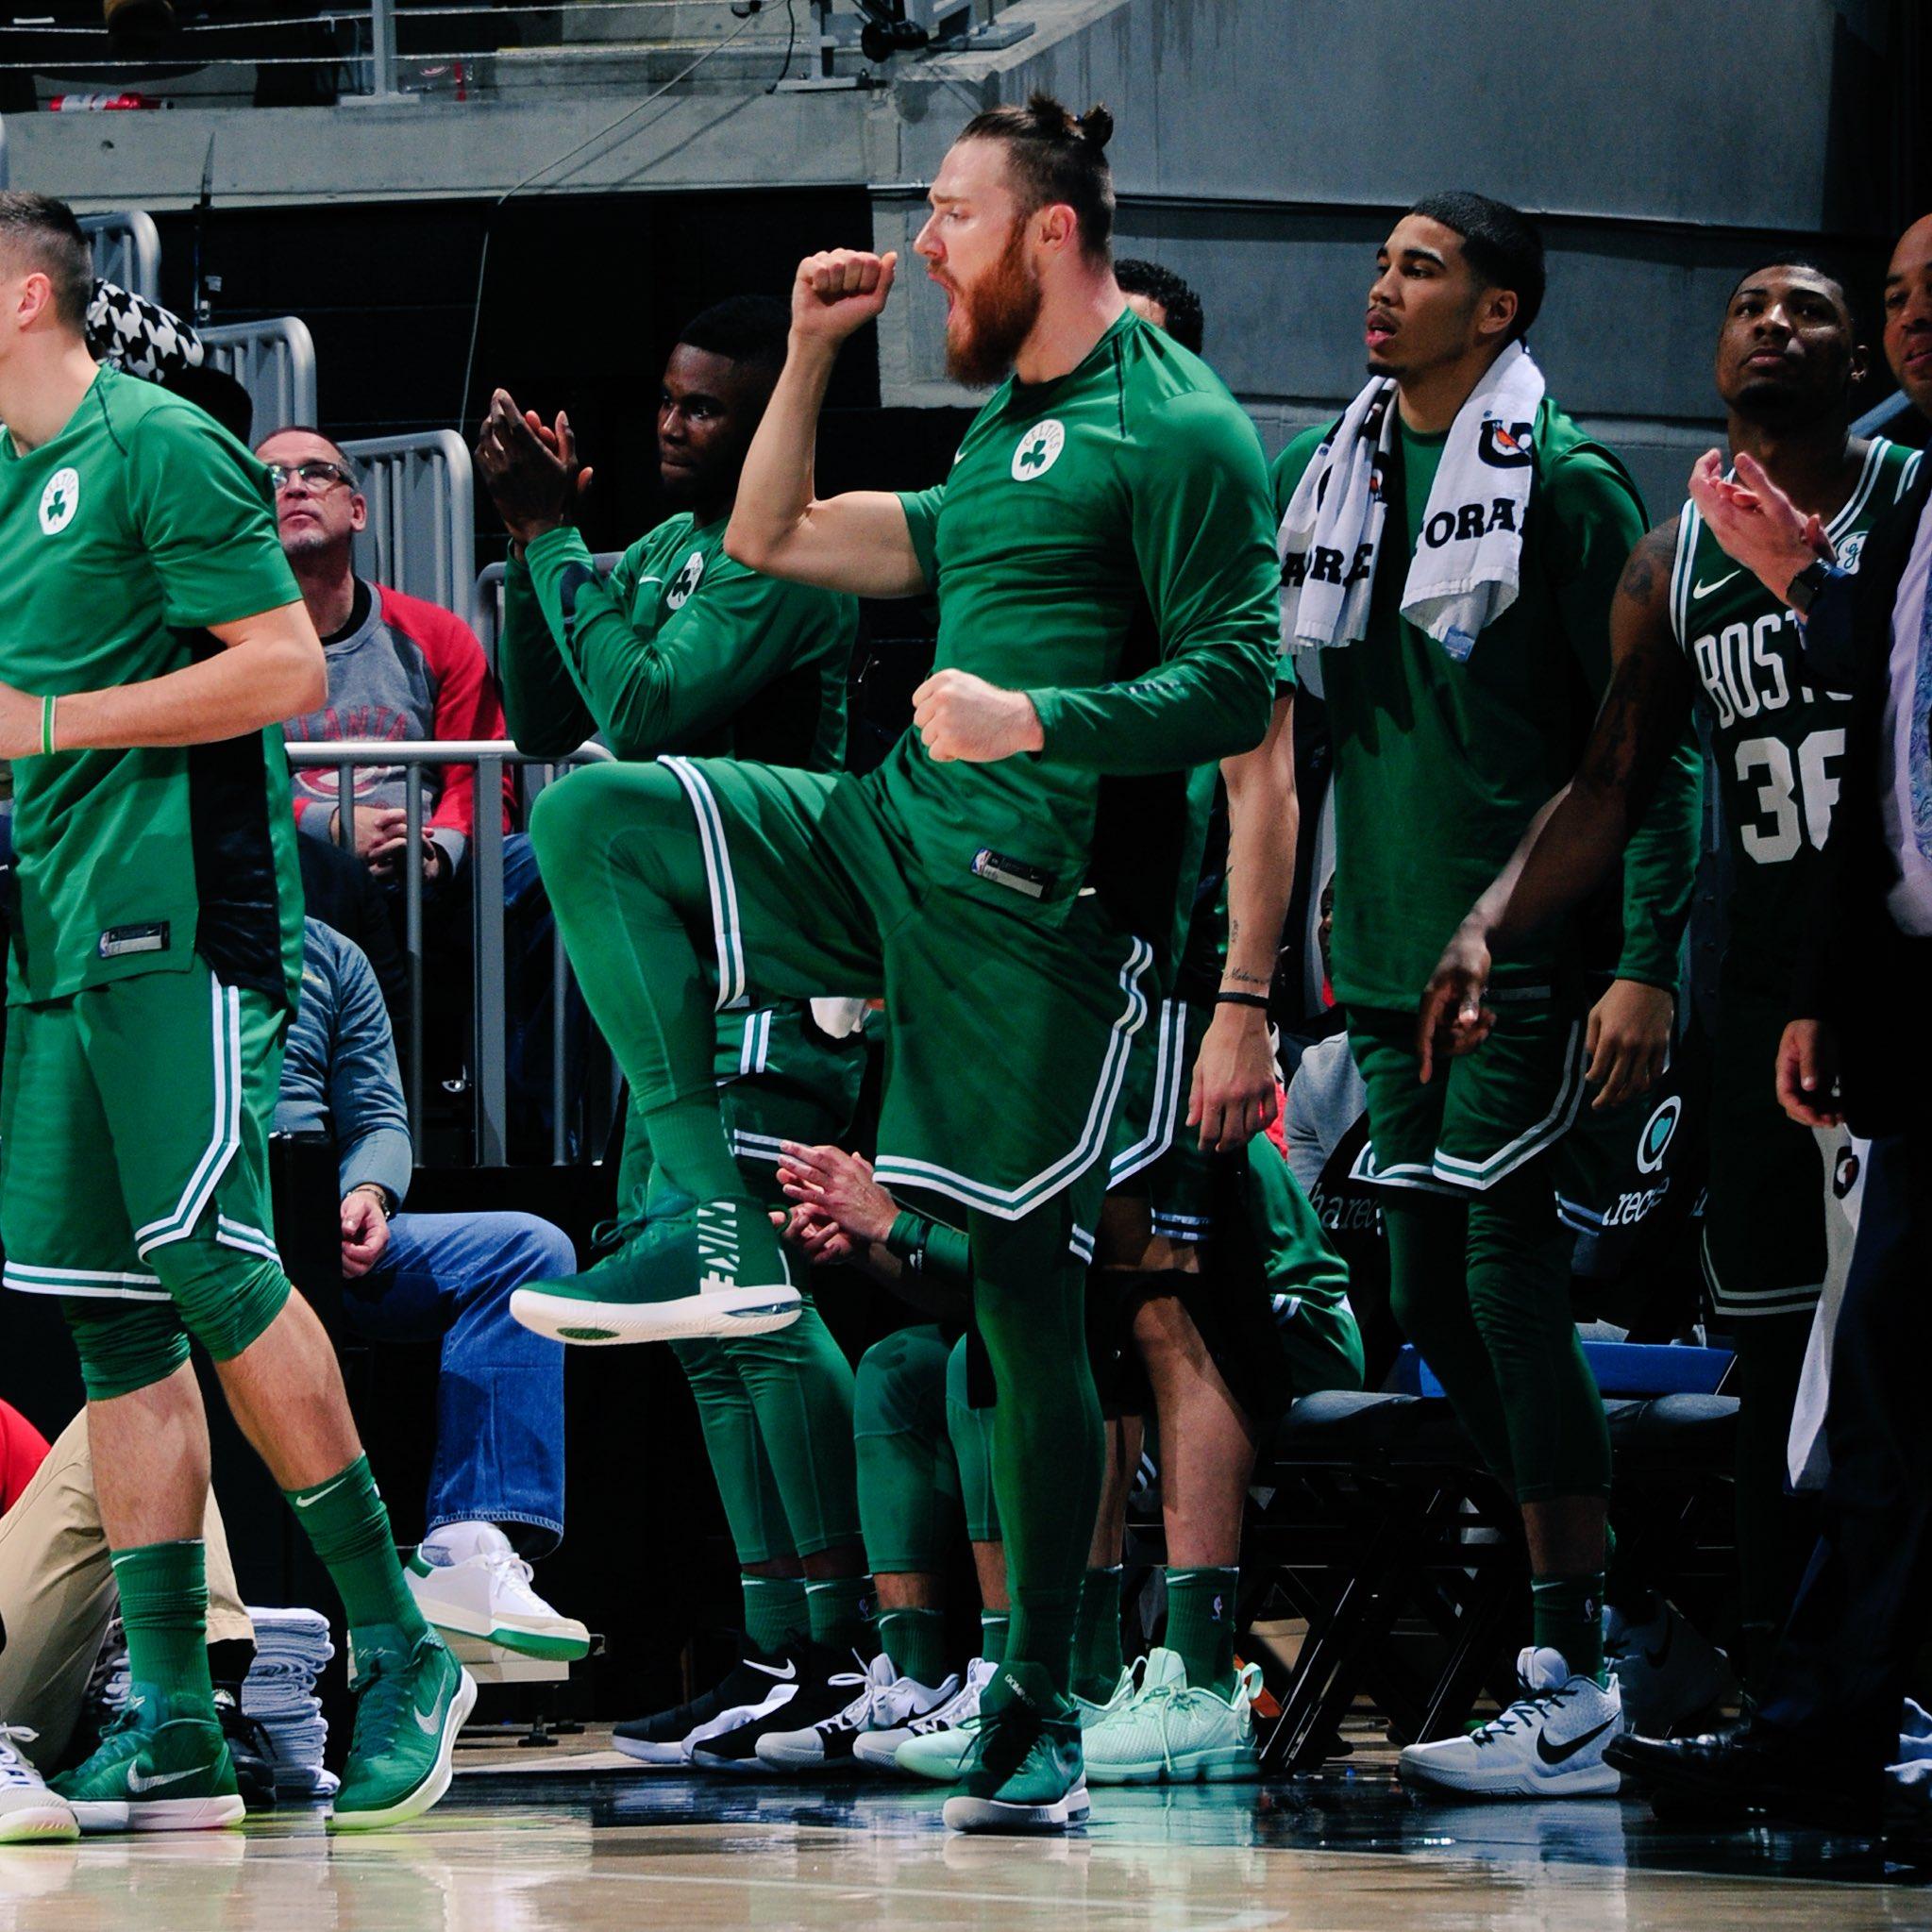 MAKE IT 15 IN A ROW  #CelticsWin in Atlanta 110-99 https://t.co/c2VYQn3LhR